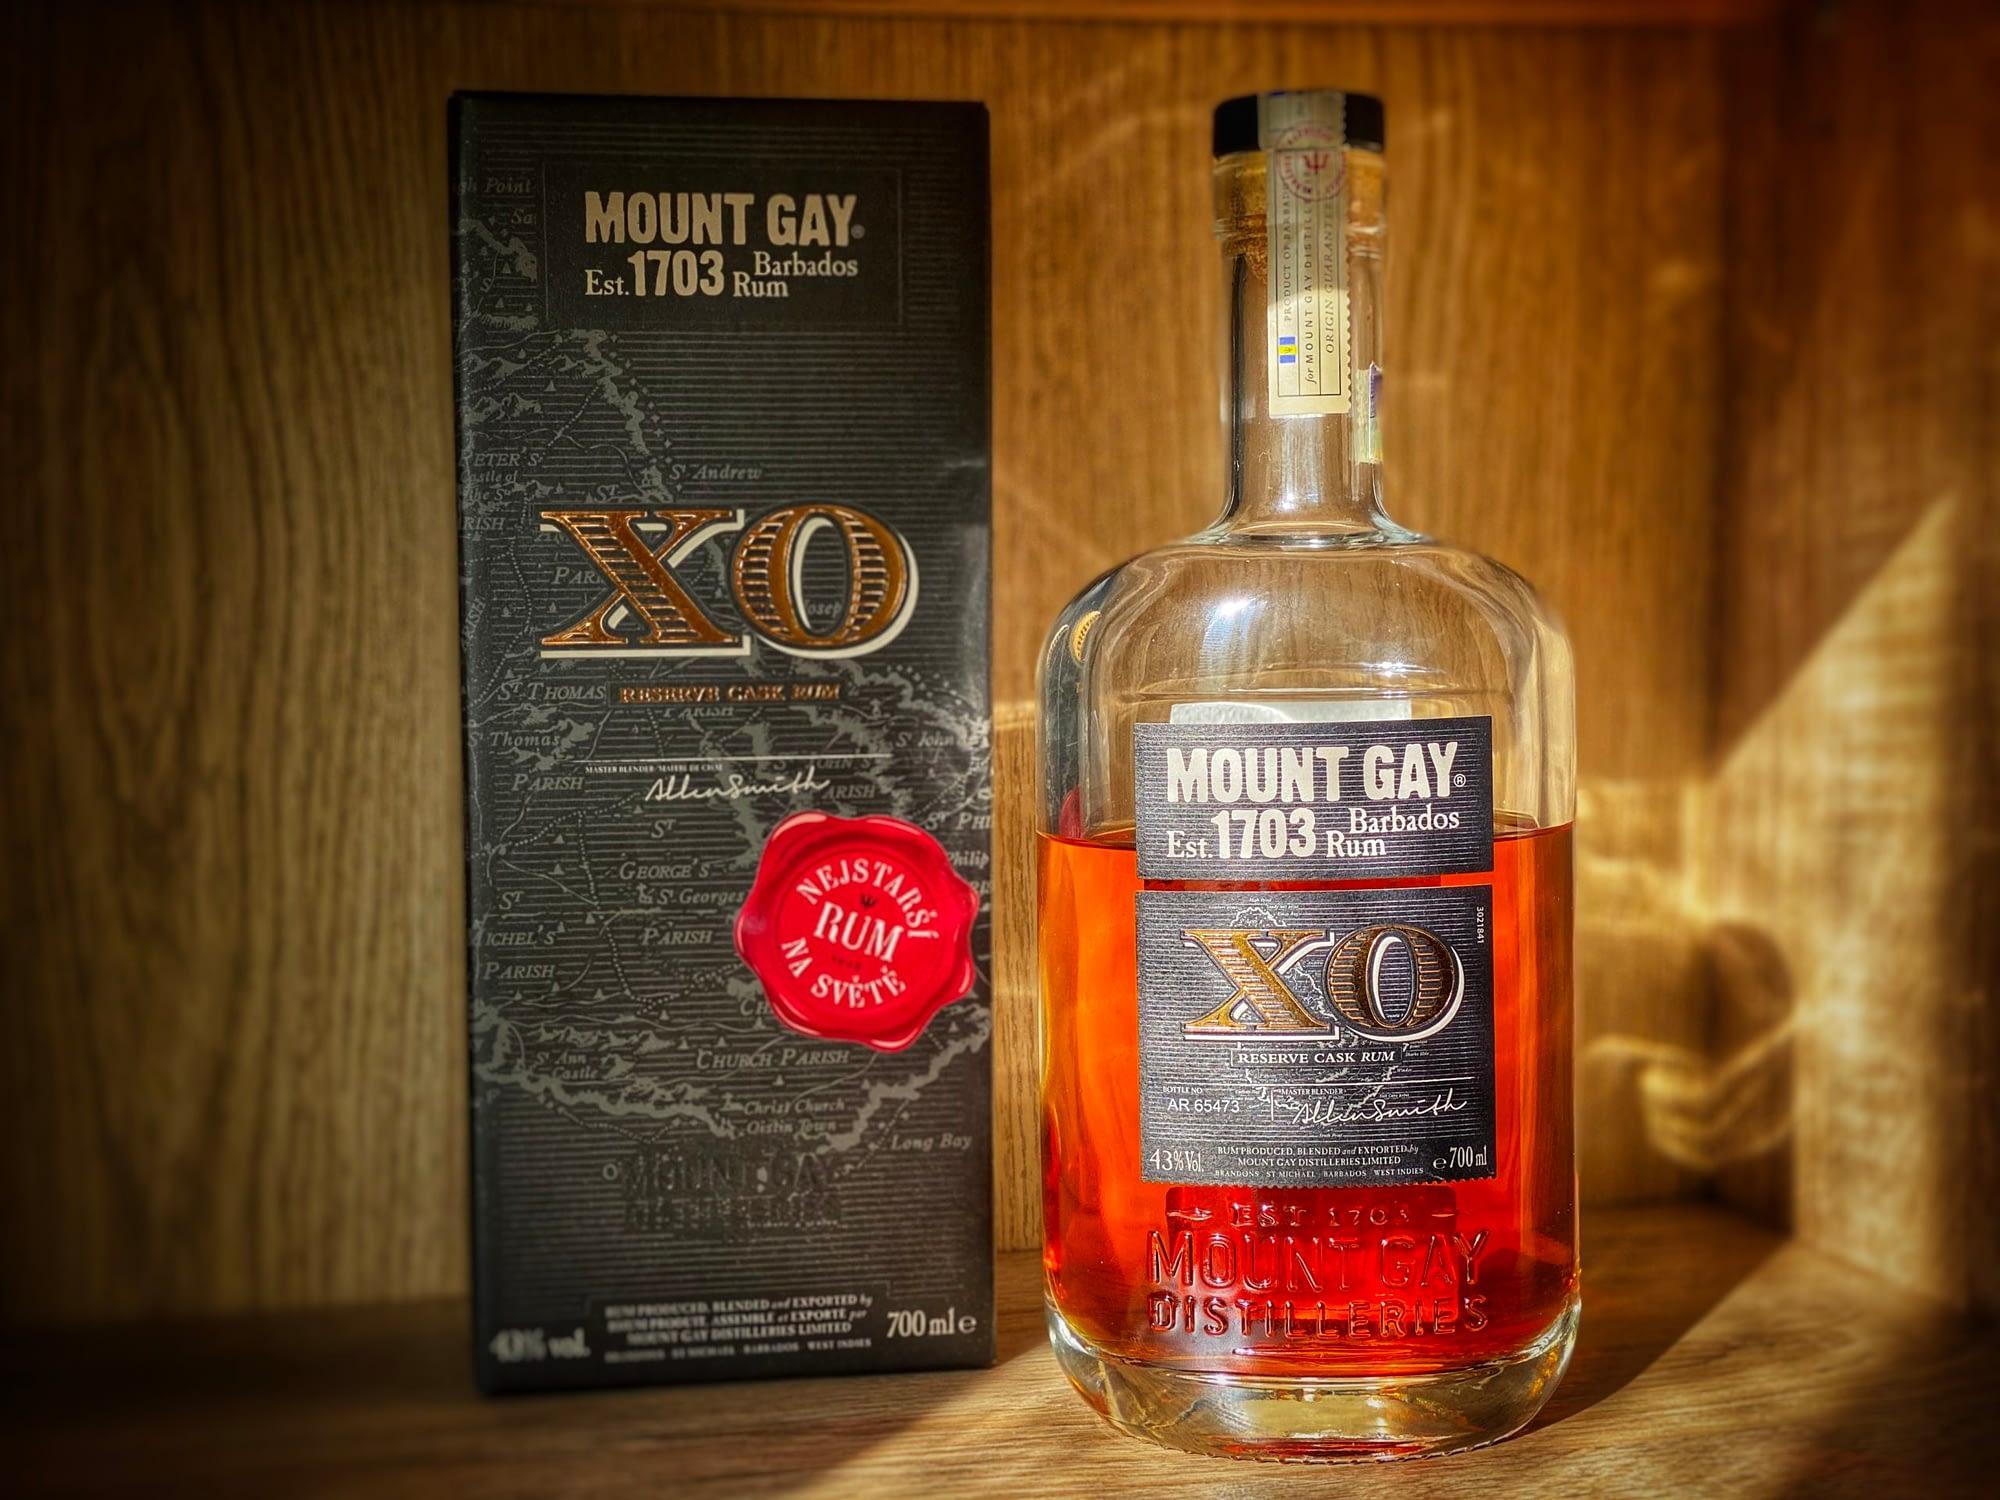 Mount Gay XO review